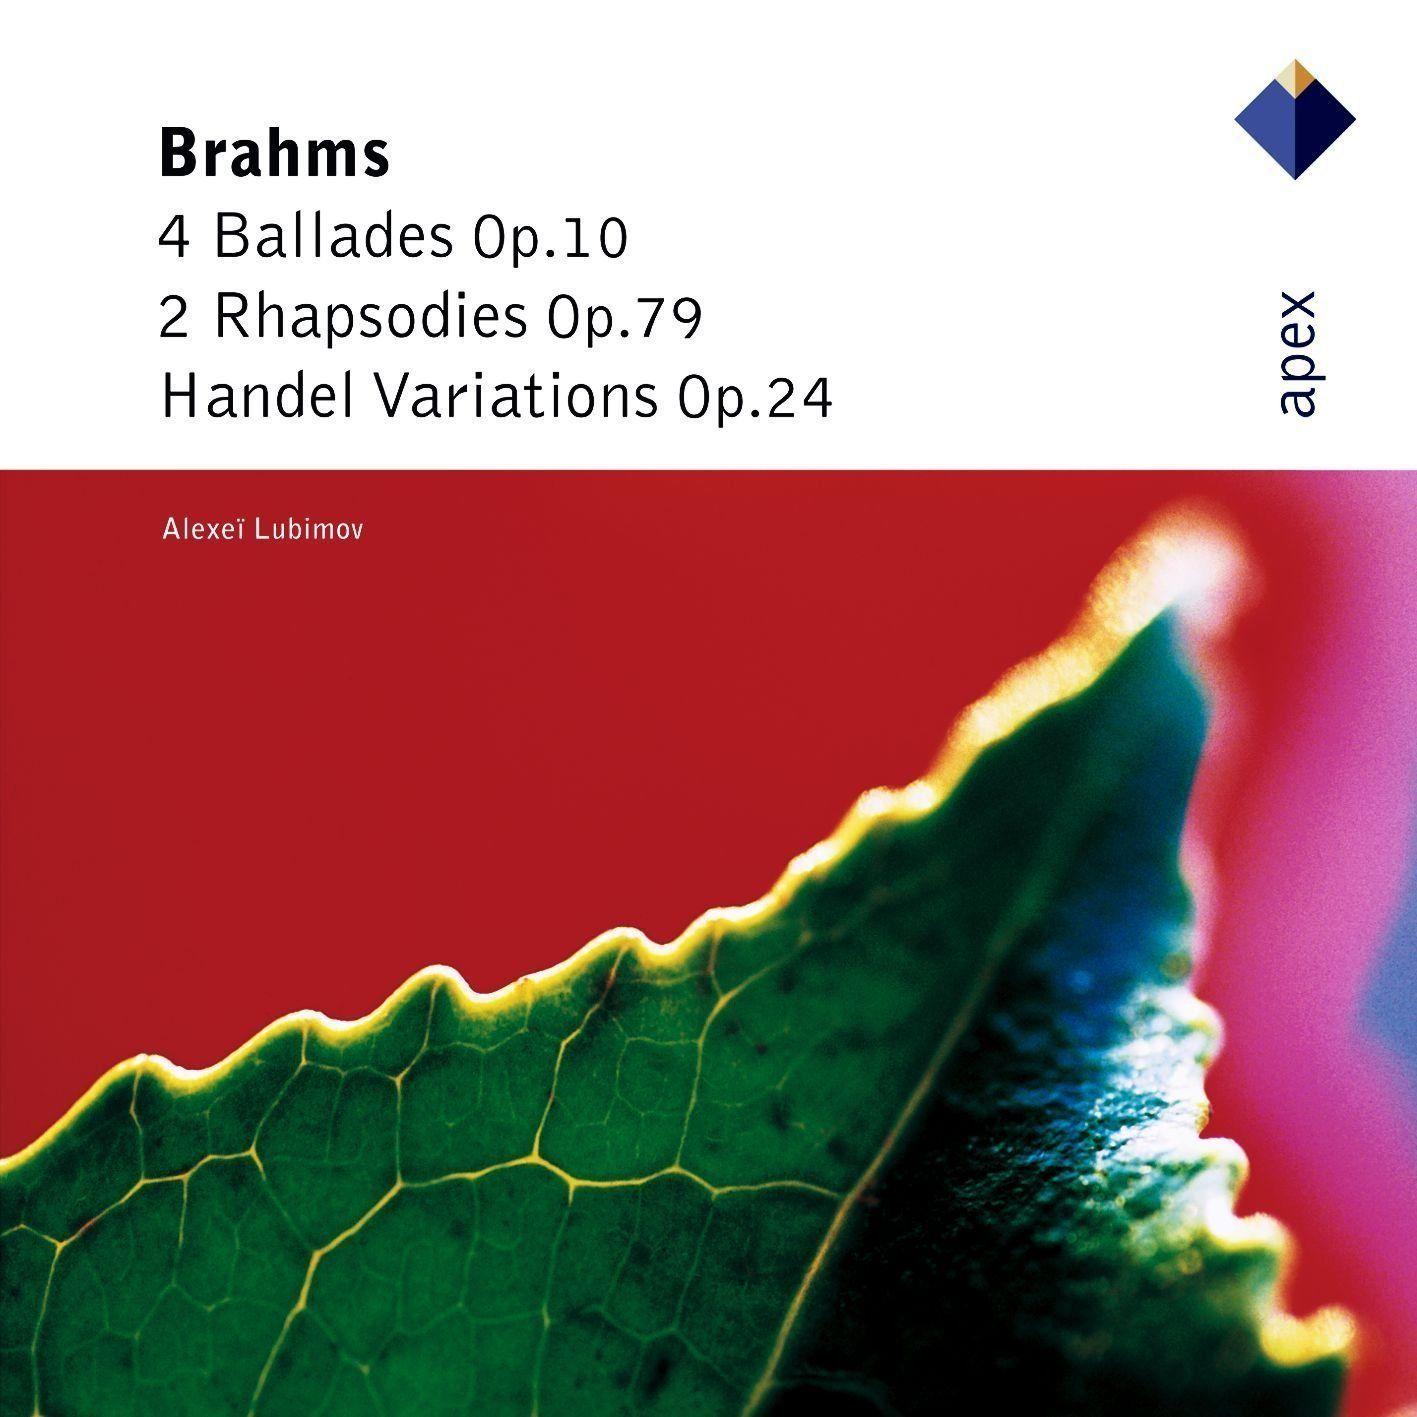 ЛЮБИМОВ, АЛЕКСЕЙ: 4 Ballades, 2 Rhapsodies, Handel Variations